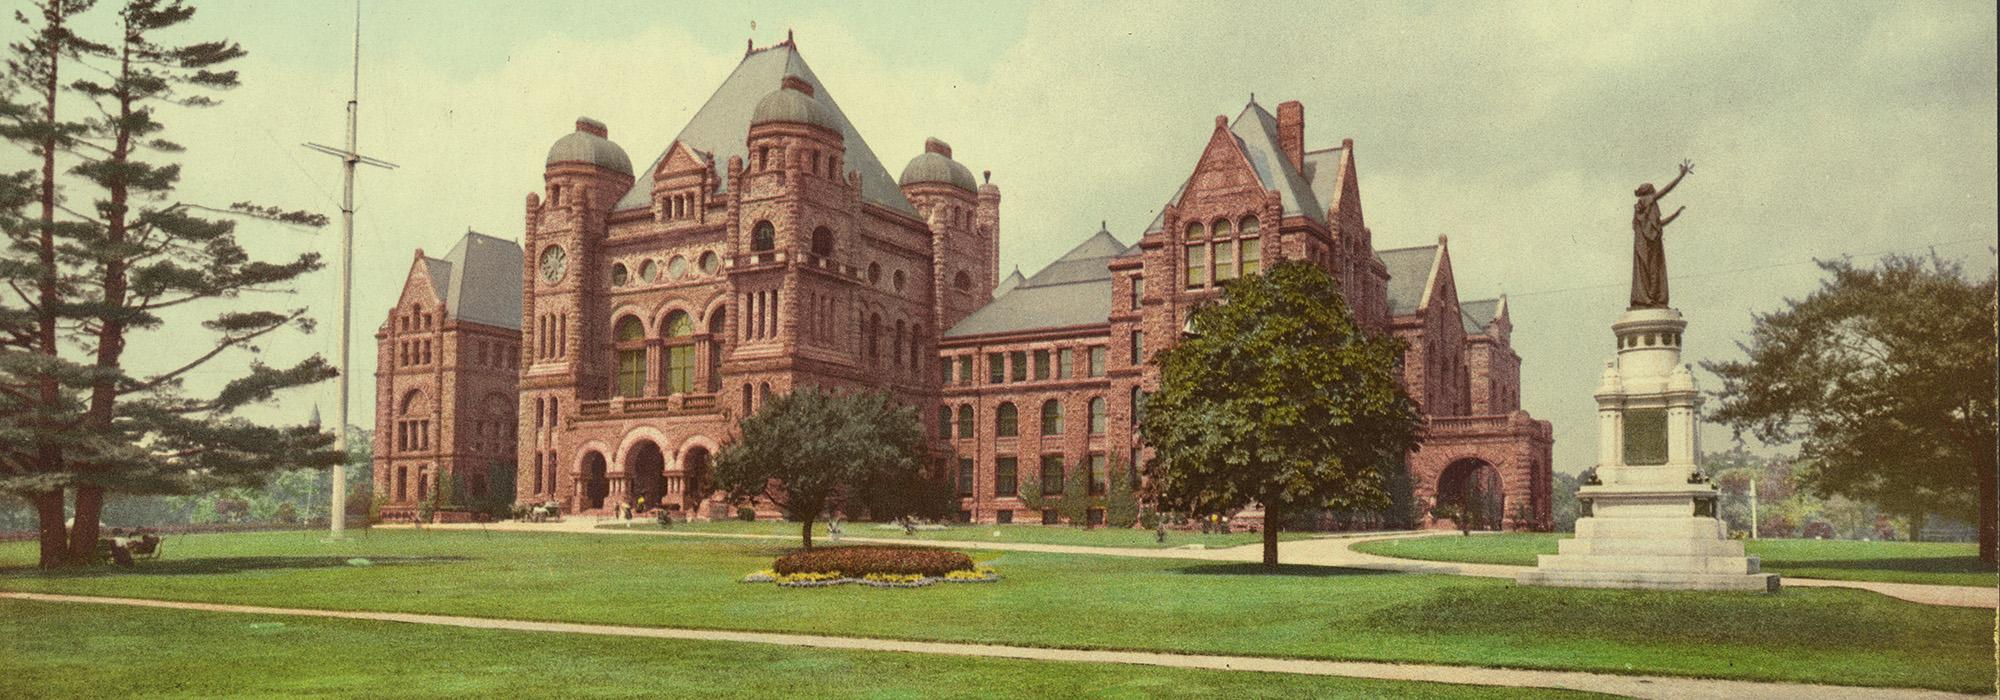 TorontoParliamentBuildings_DetroitPublishingCompany_1901.jpg